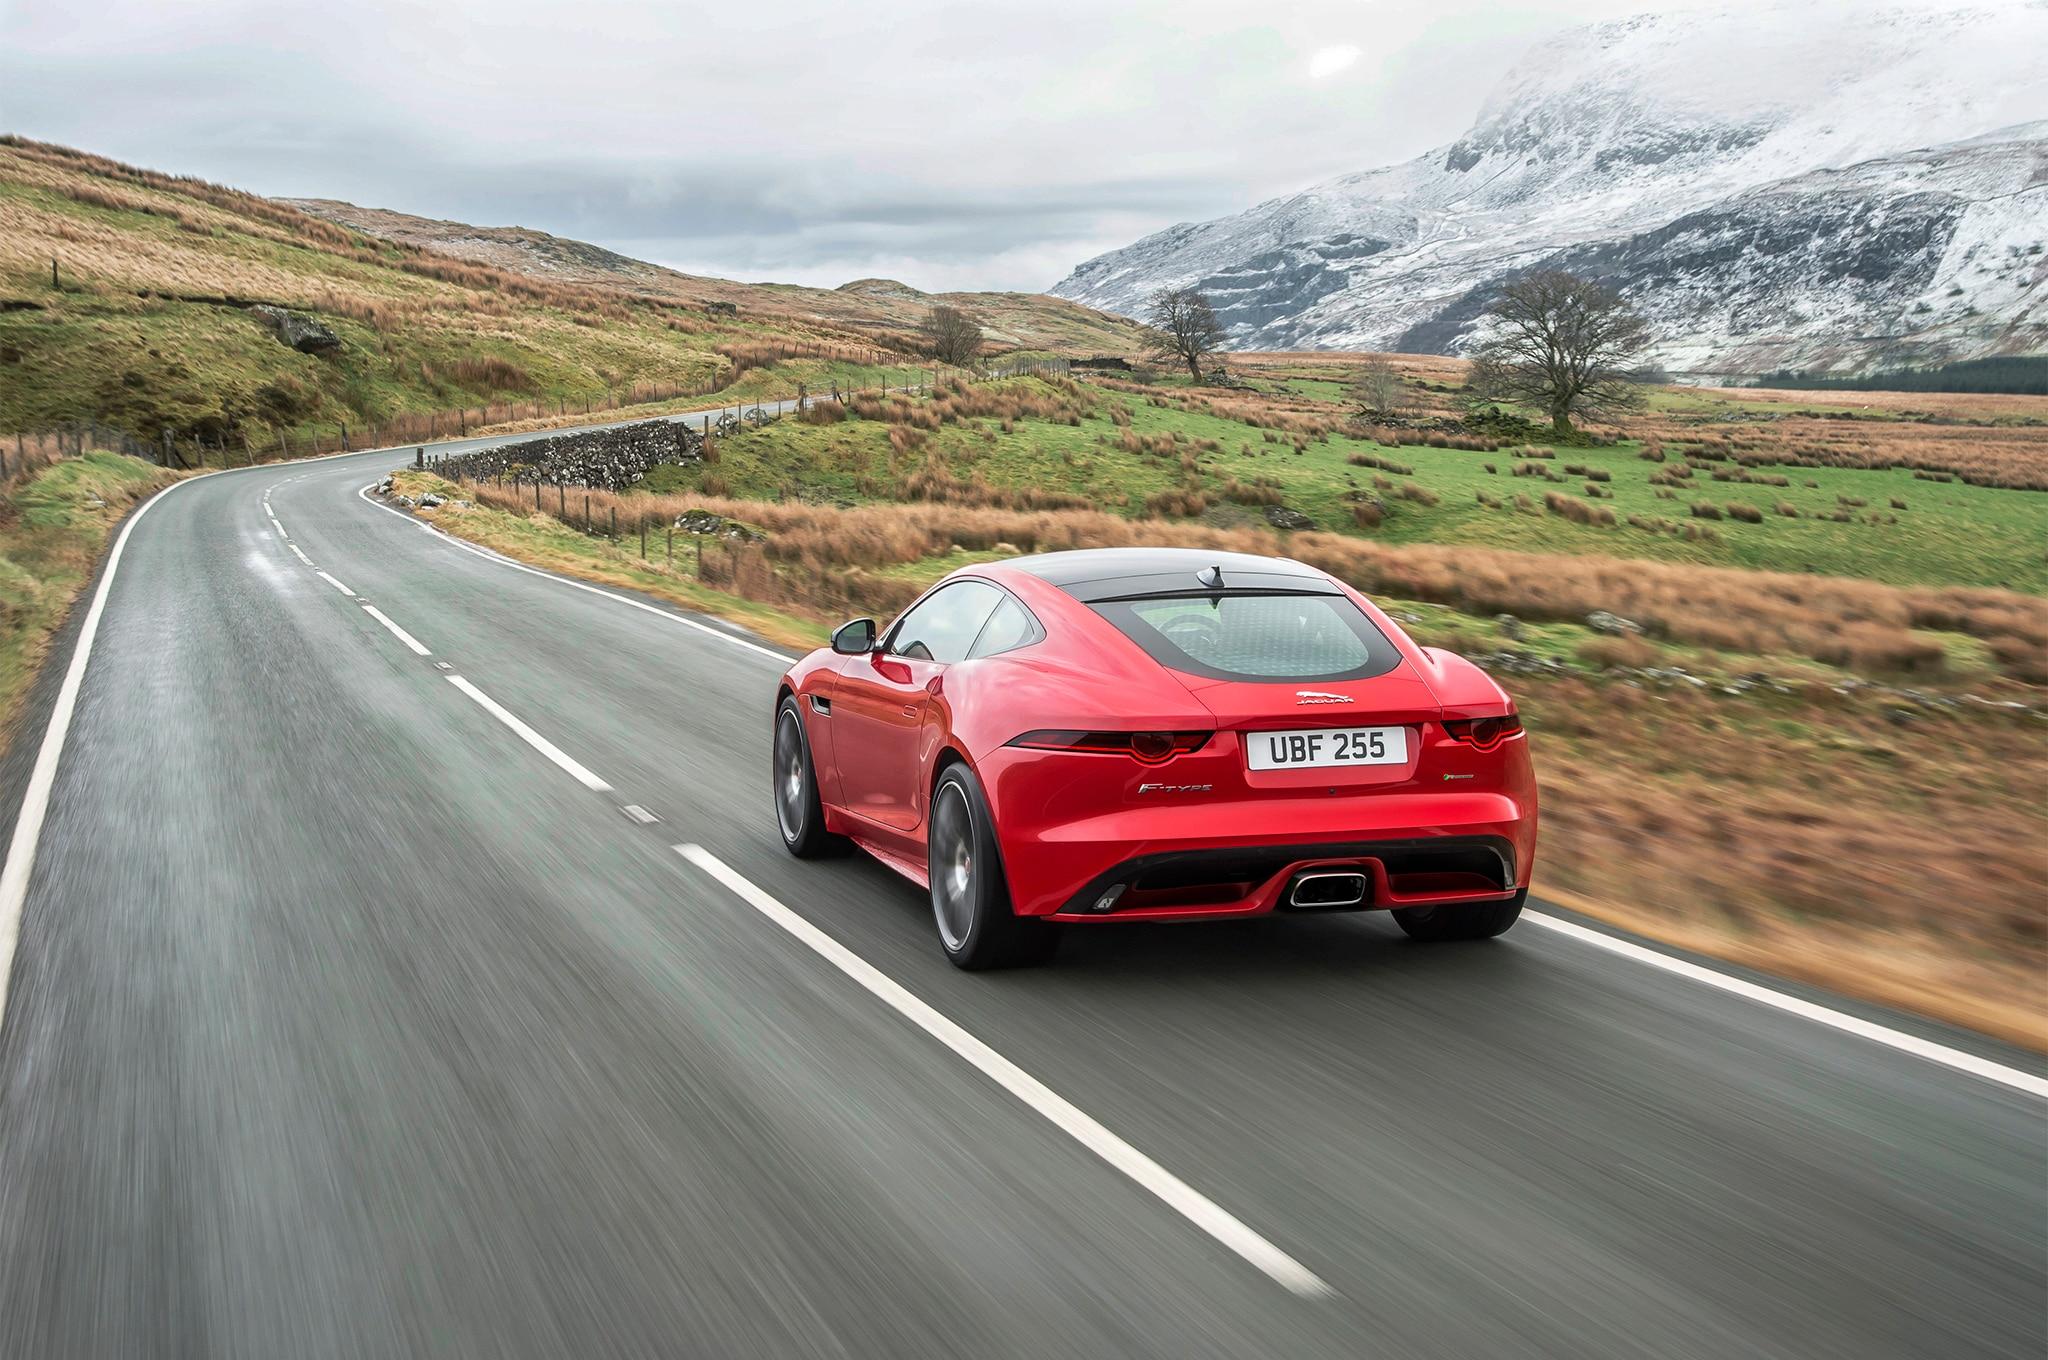 2018-Jaguar-F-Type-four-cylinder-rear-three-quarter-in-motion-7